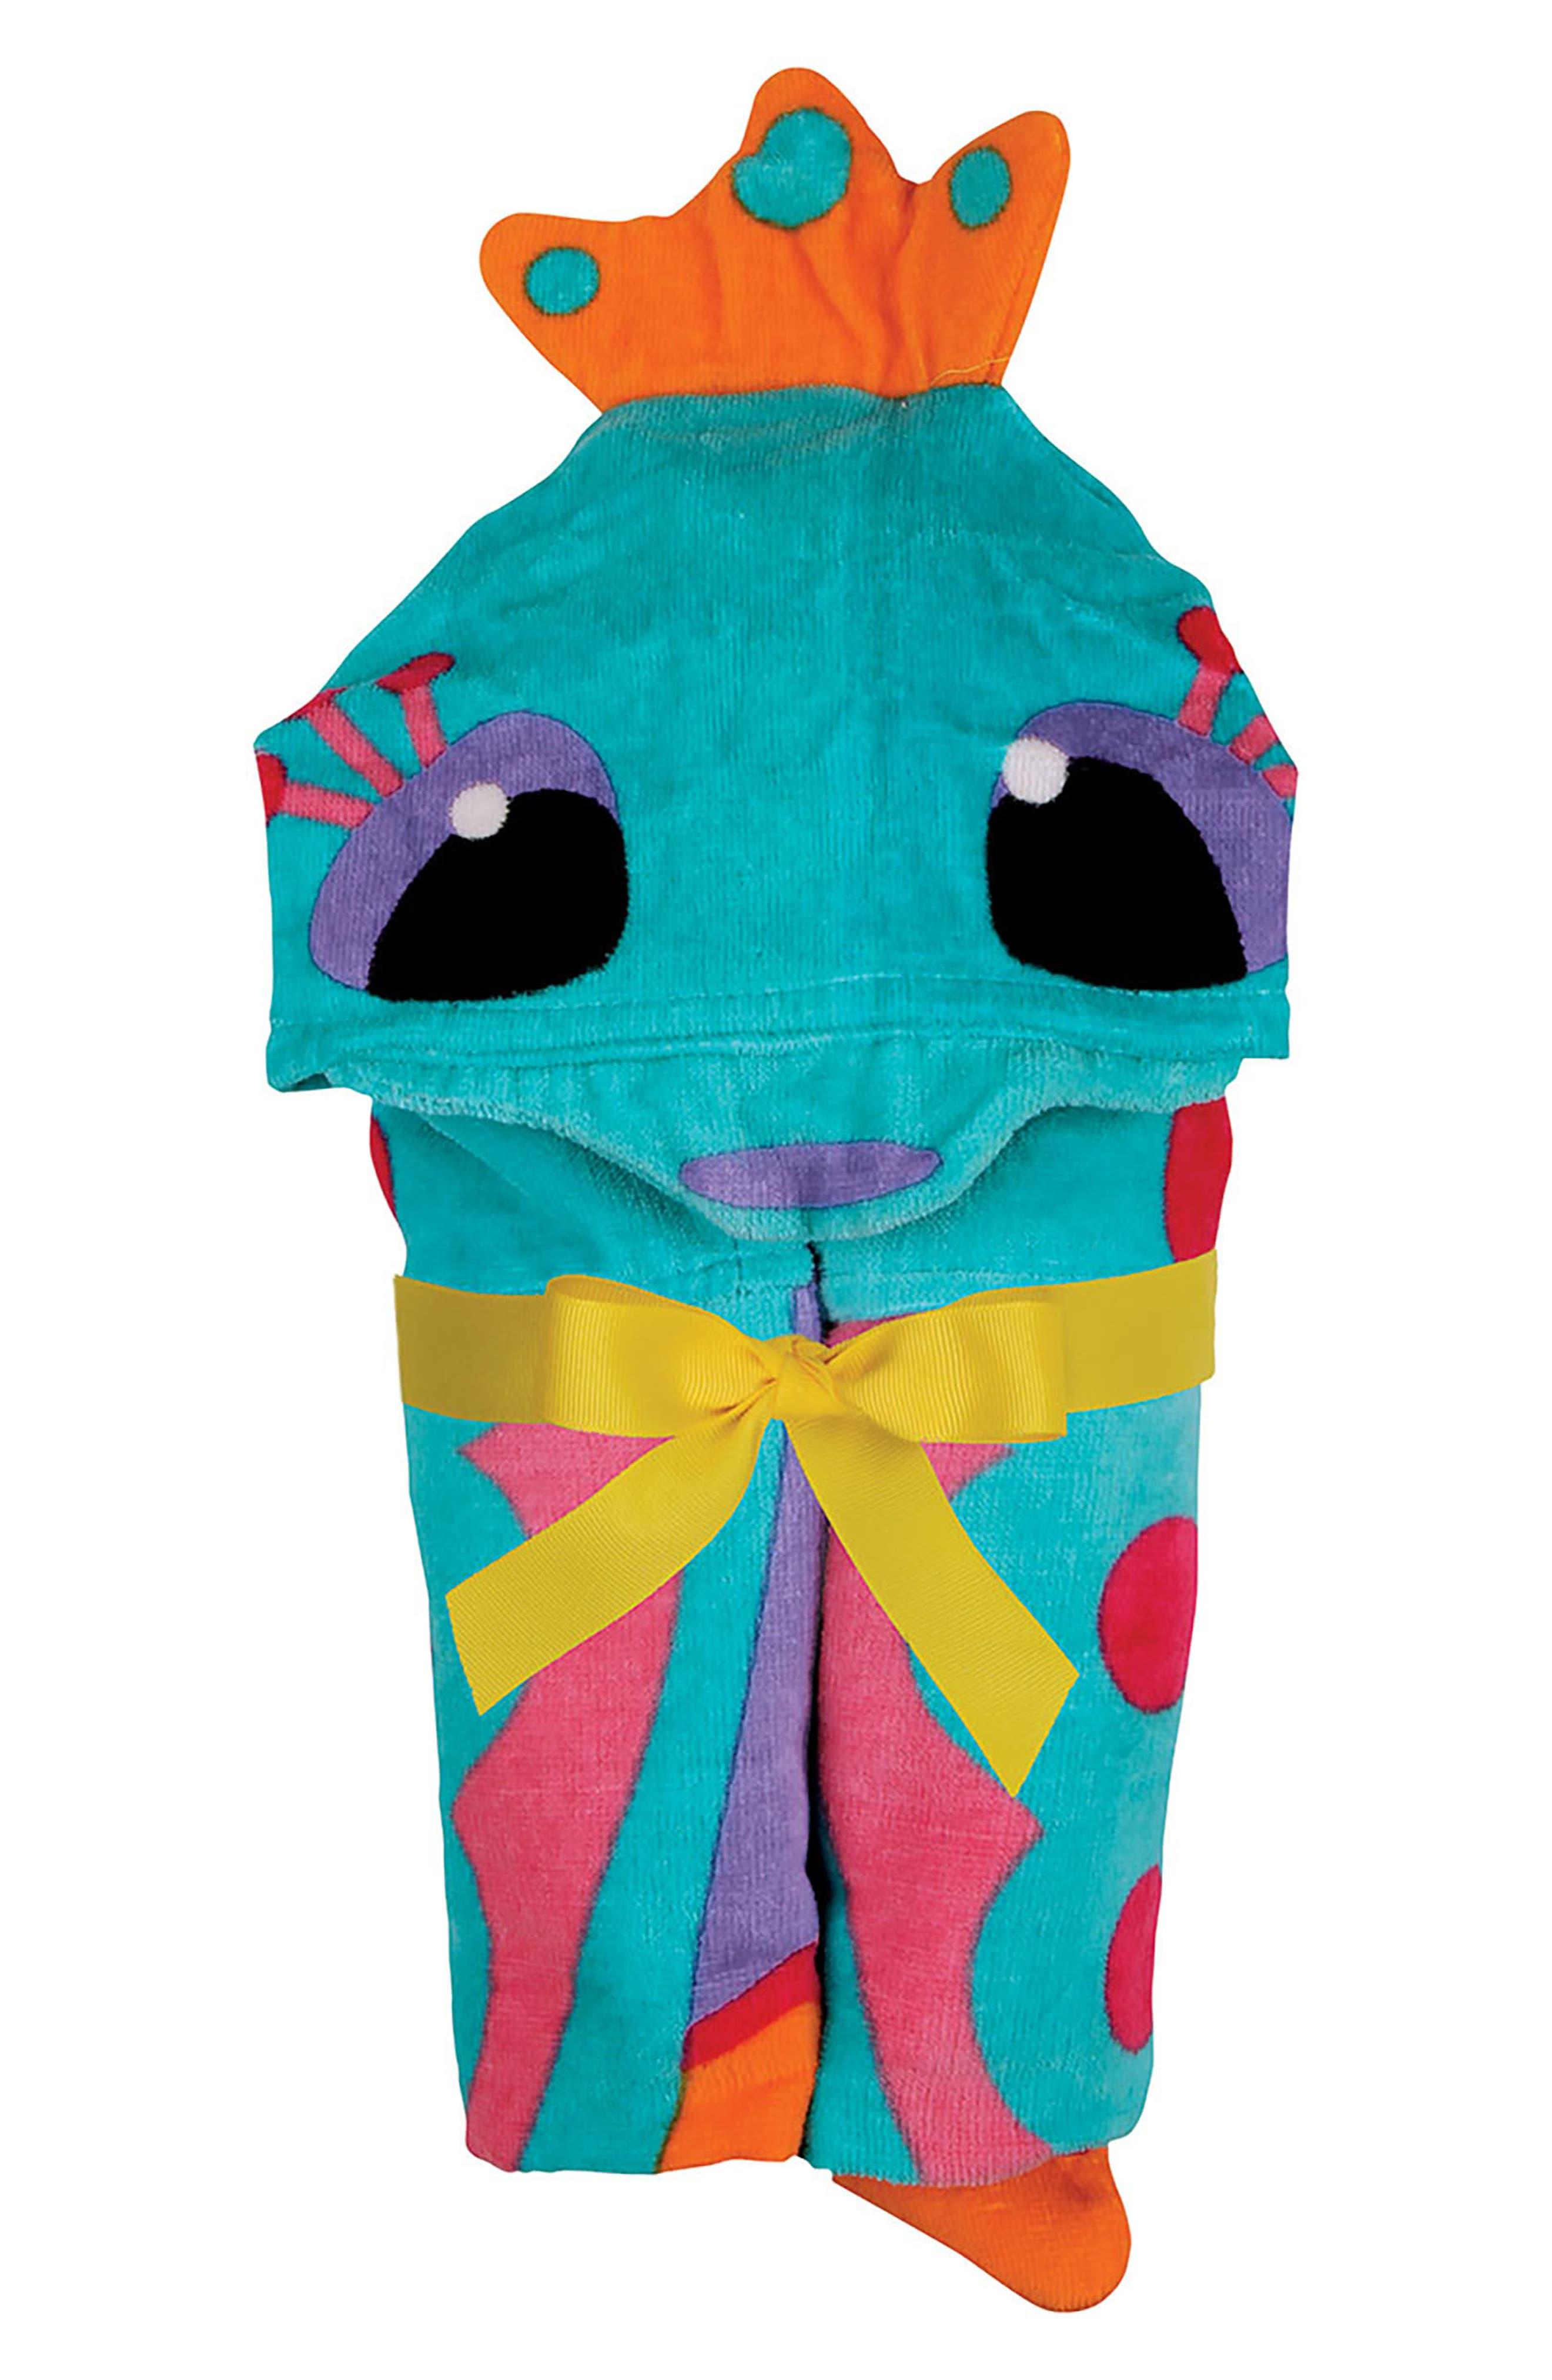 STEPHEN JOSEPH,                             Wet/Dry Bag, Hooded Towel & Goggles,                             Alternate thumbnail 5, color,                             PURPLE SEAHORSE